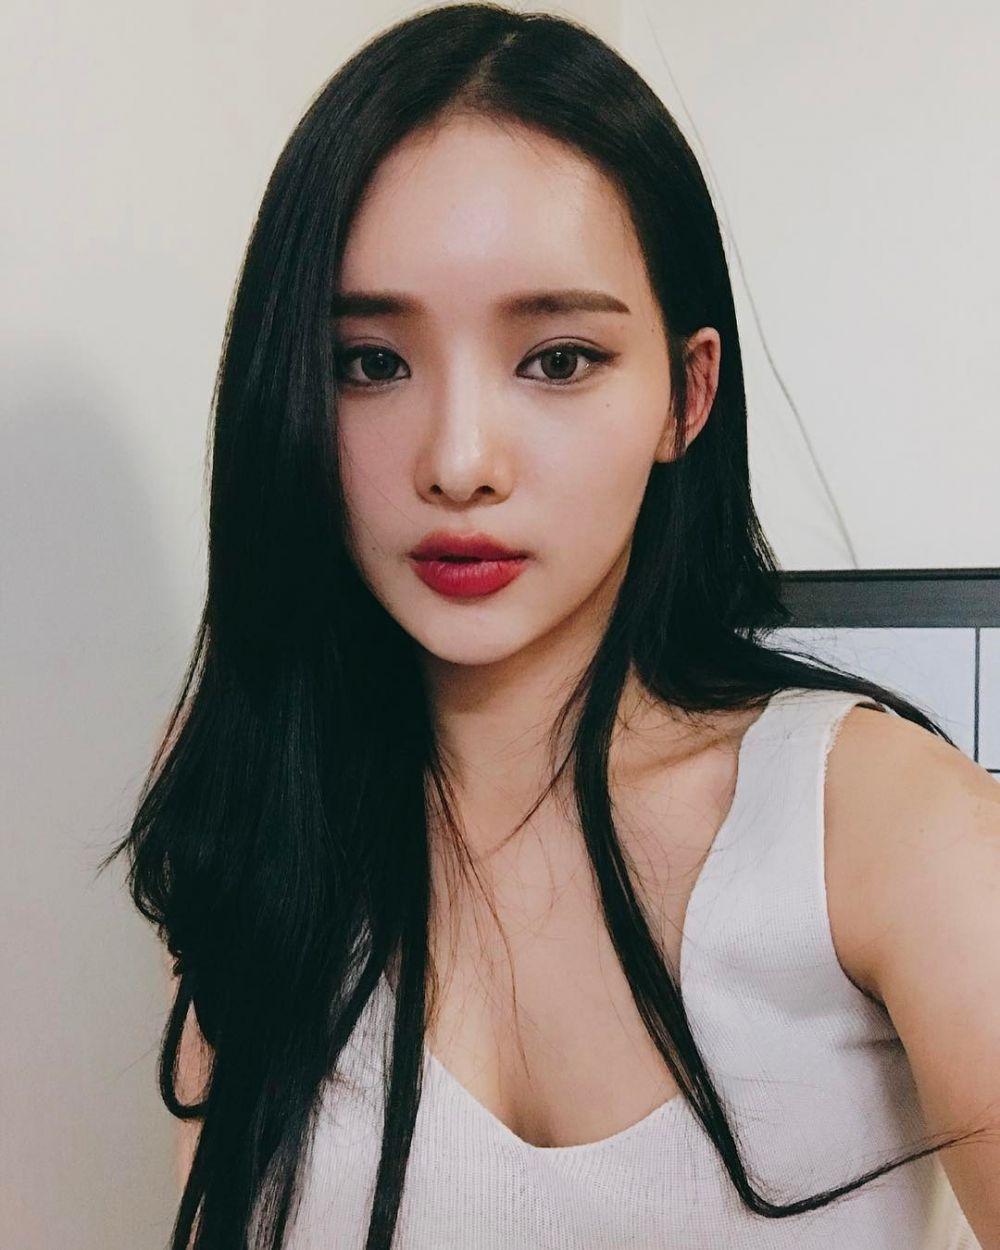 Ji-Seong © 2017 instagram.com/jeee622